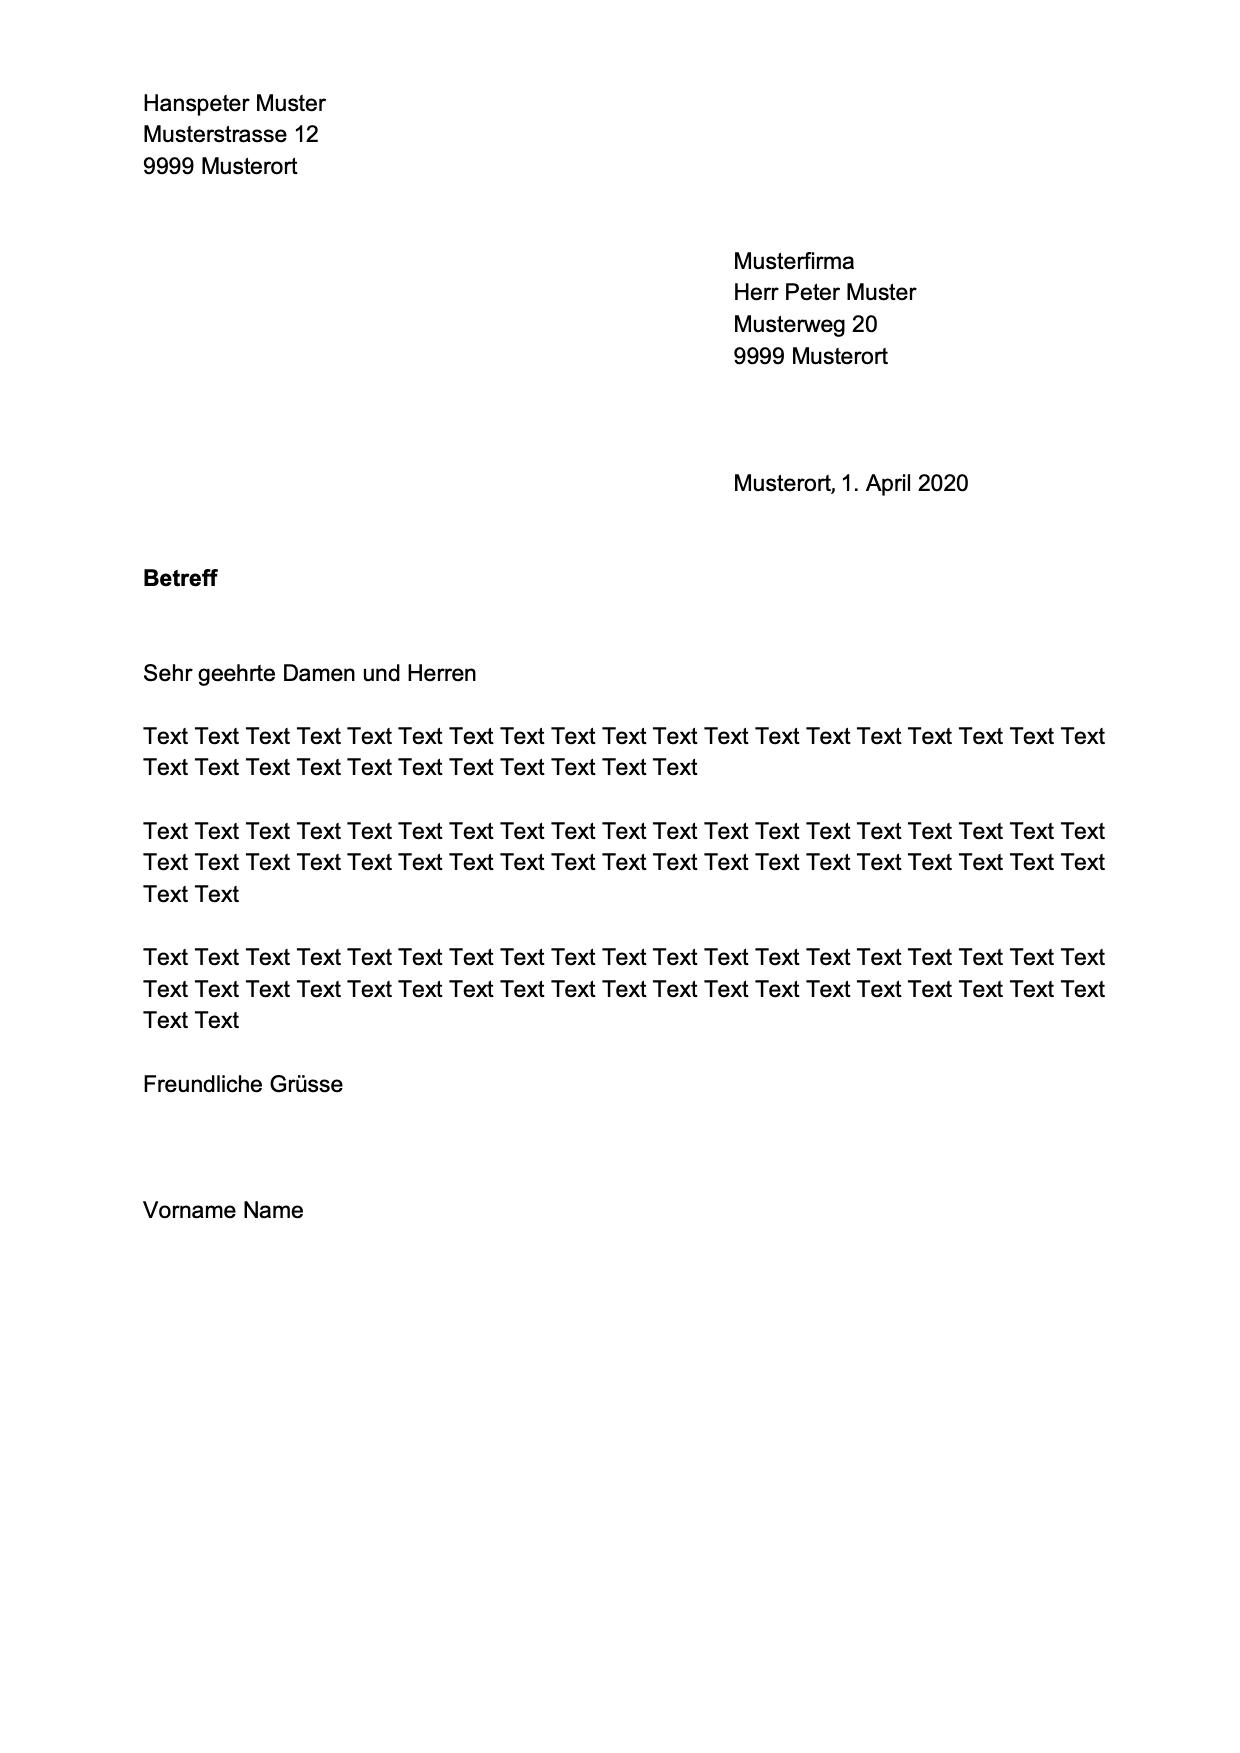 Briefe Office Com